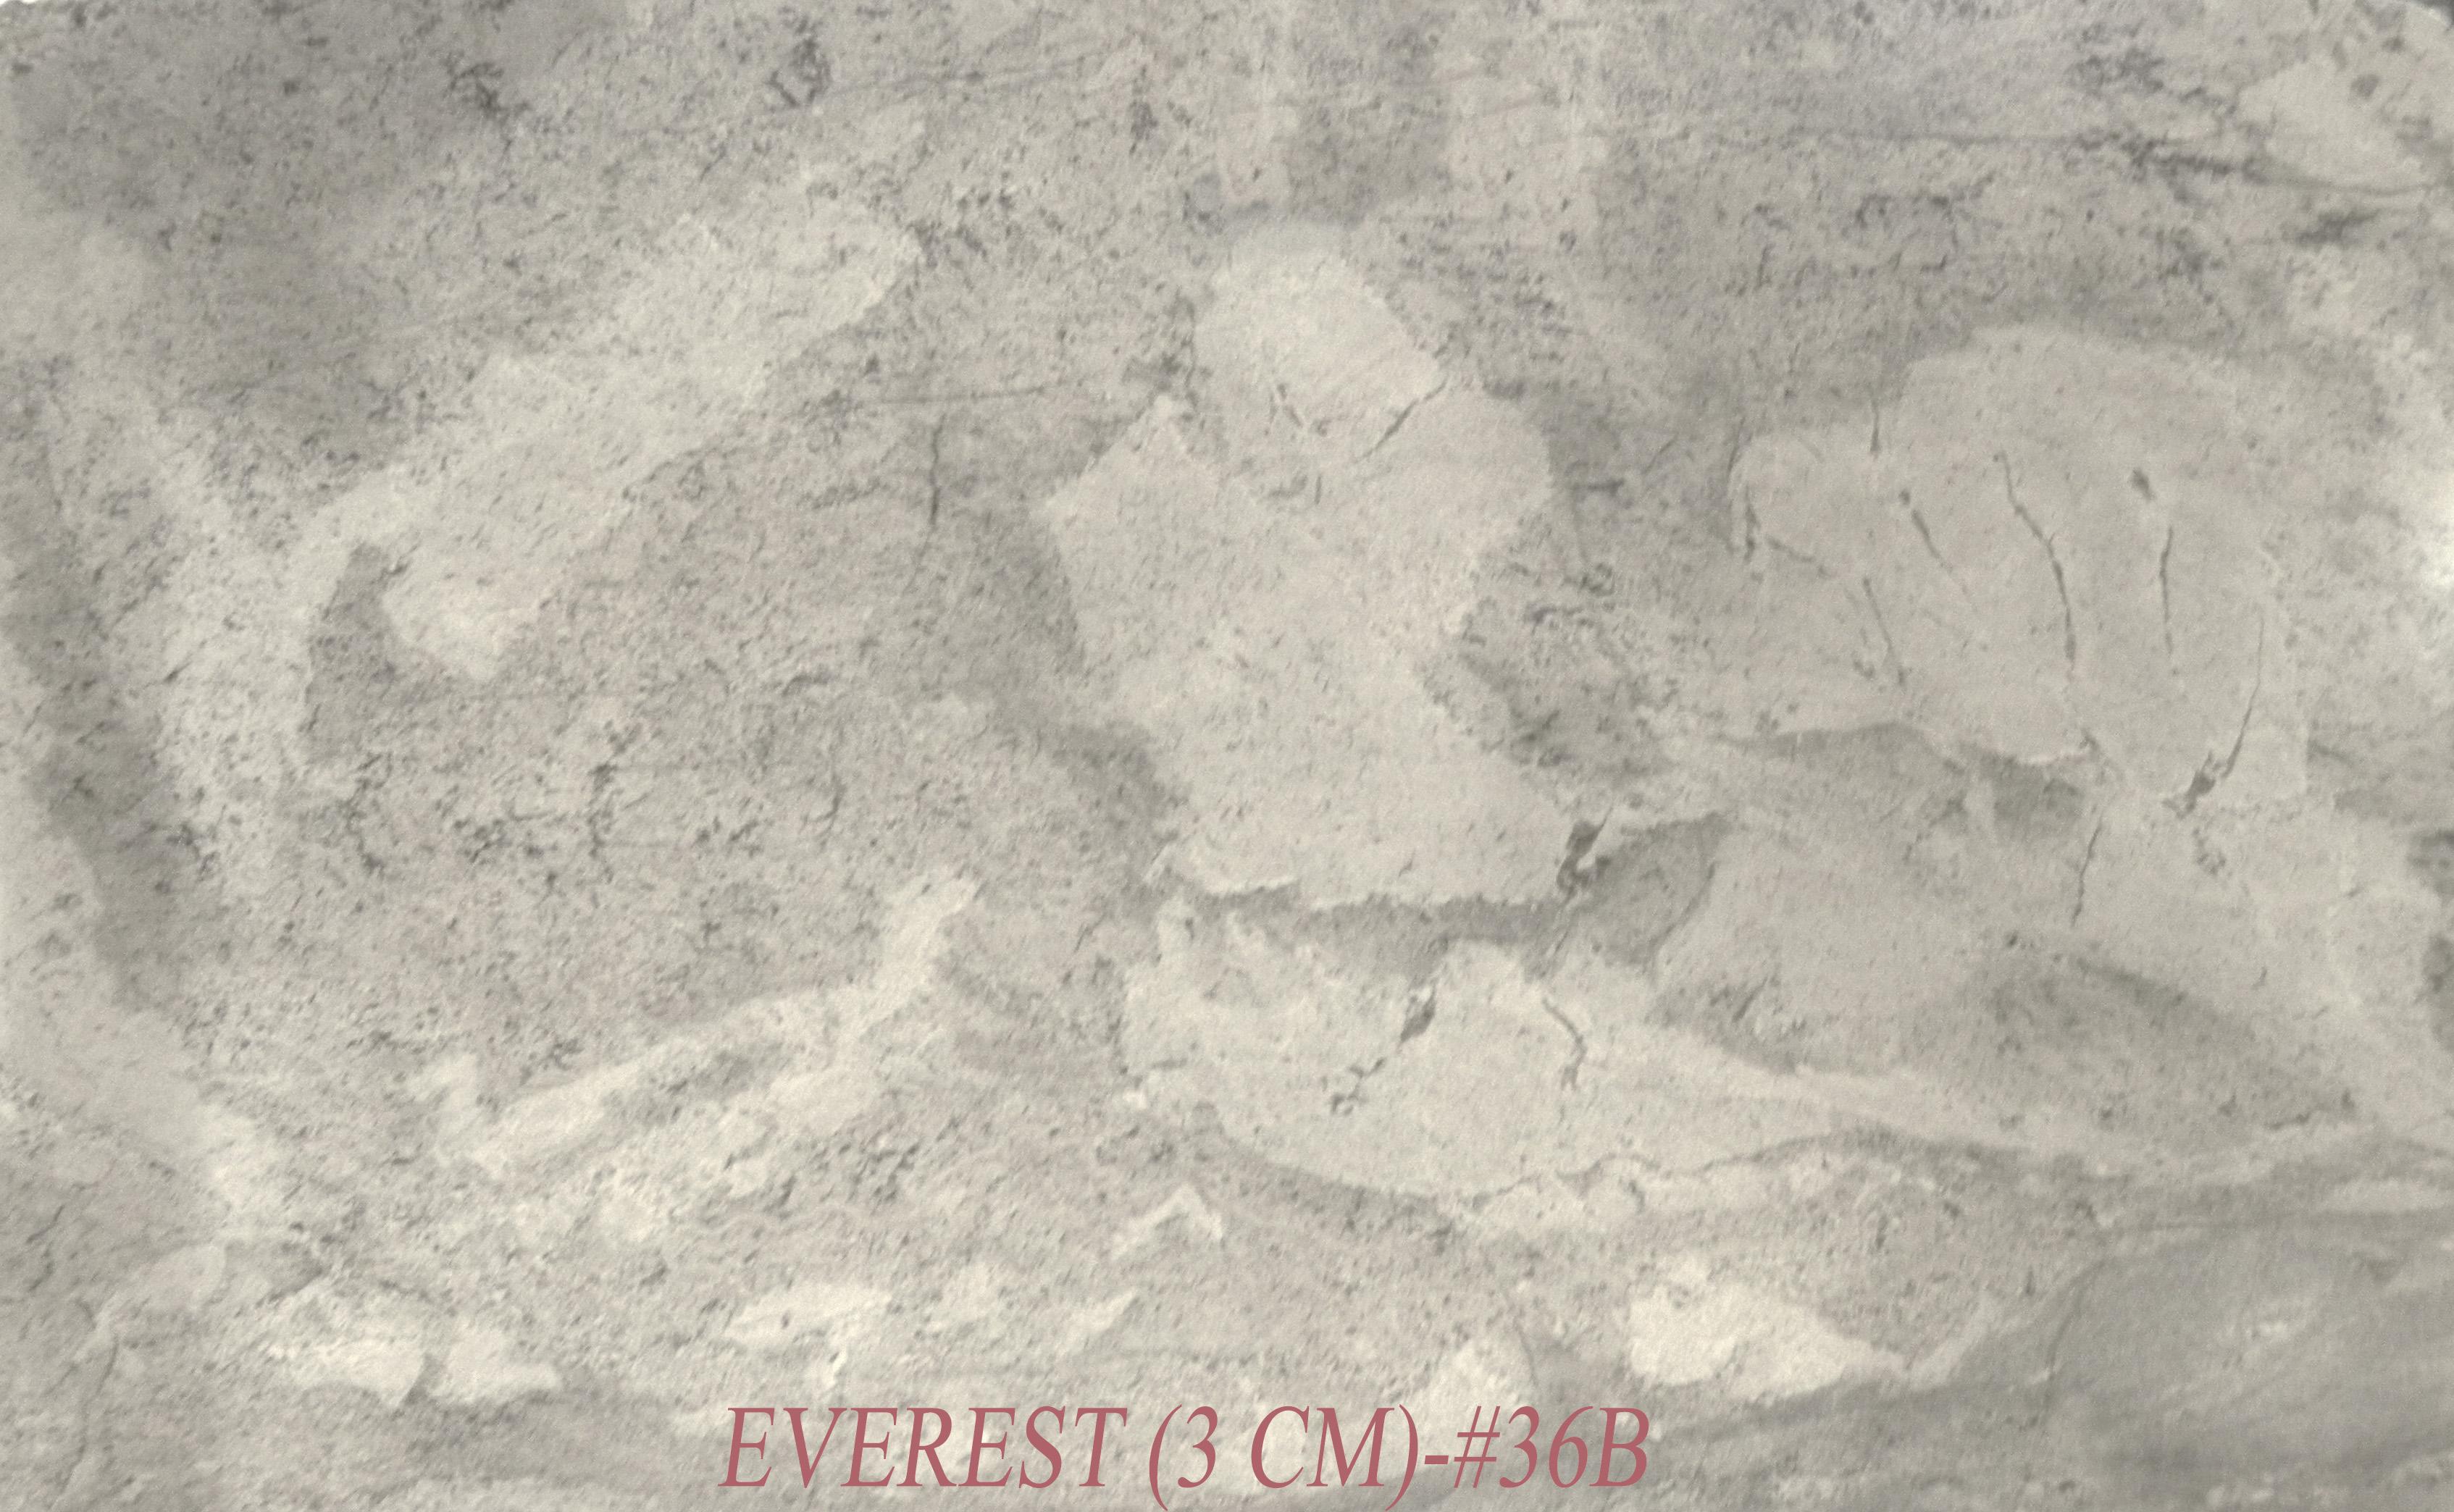 EVEREST (3 CM) -#36B